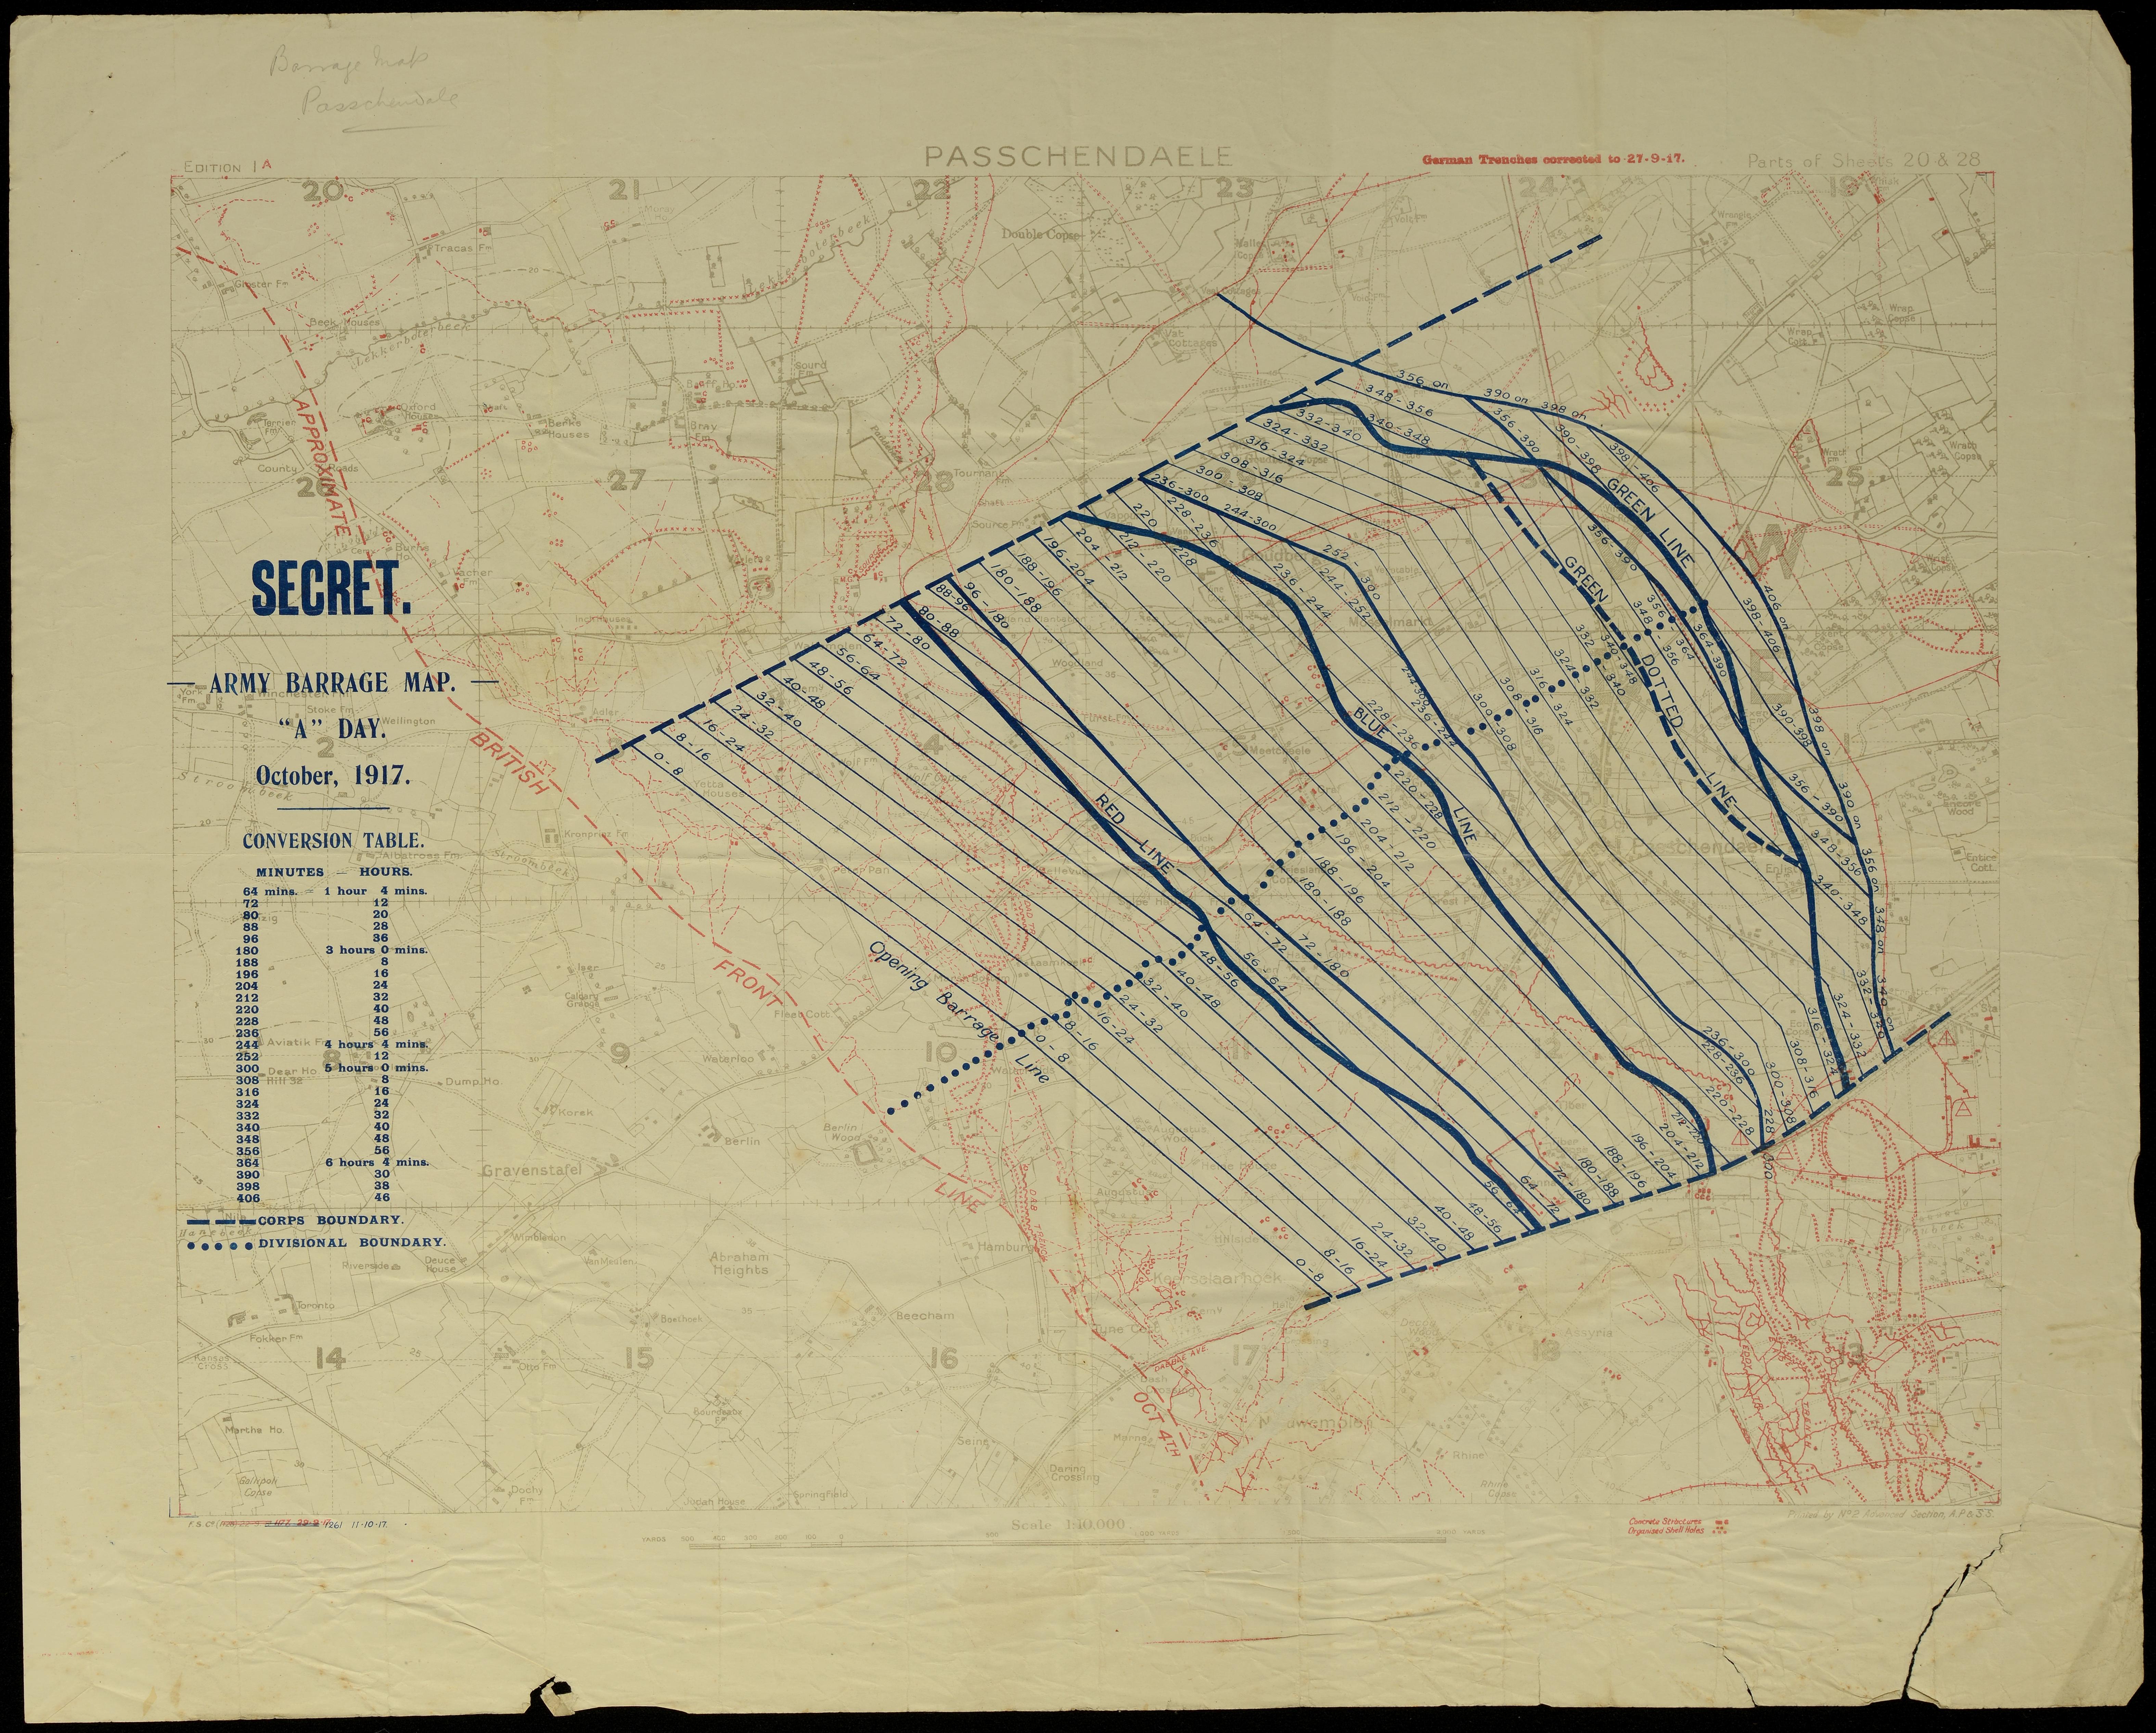 Passchendaele Barrage Map Archives Reference WA 220 Folder 13